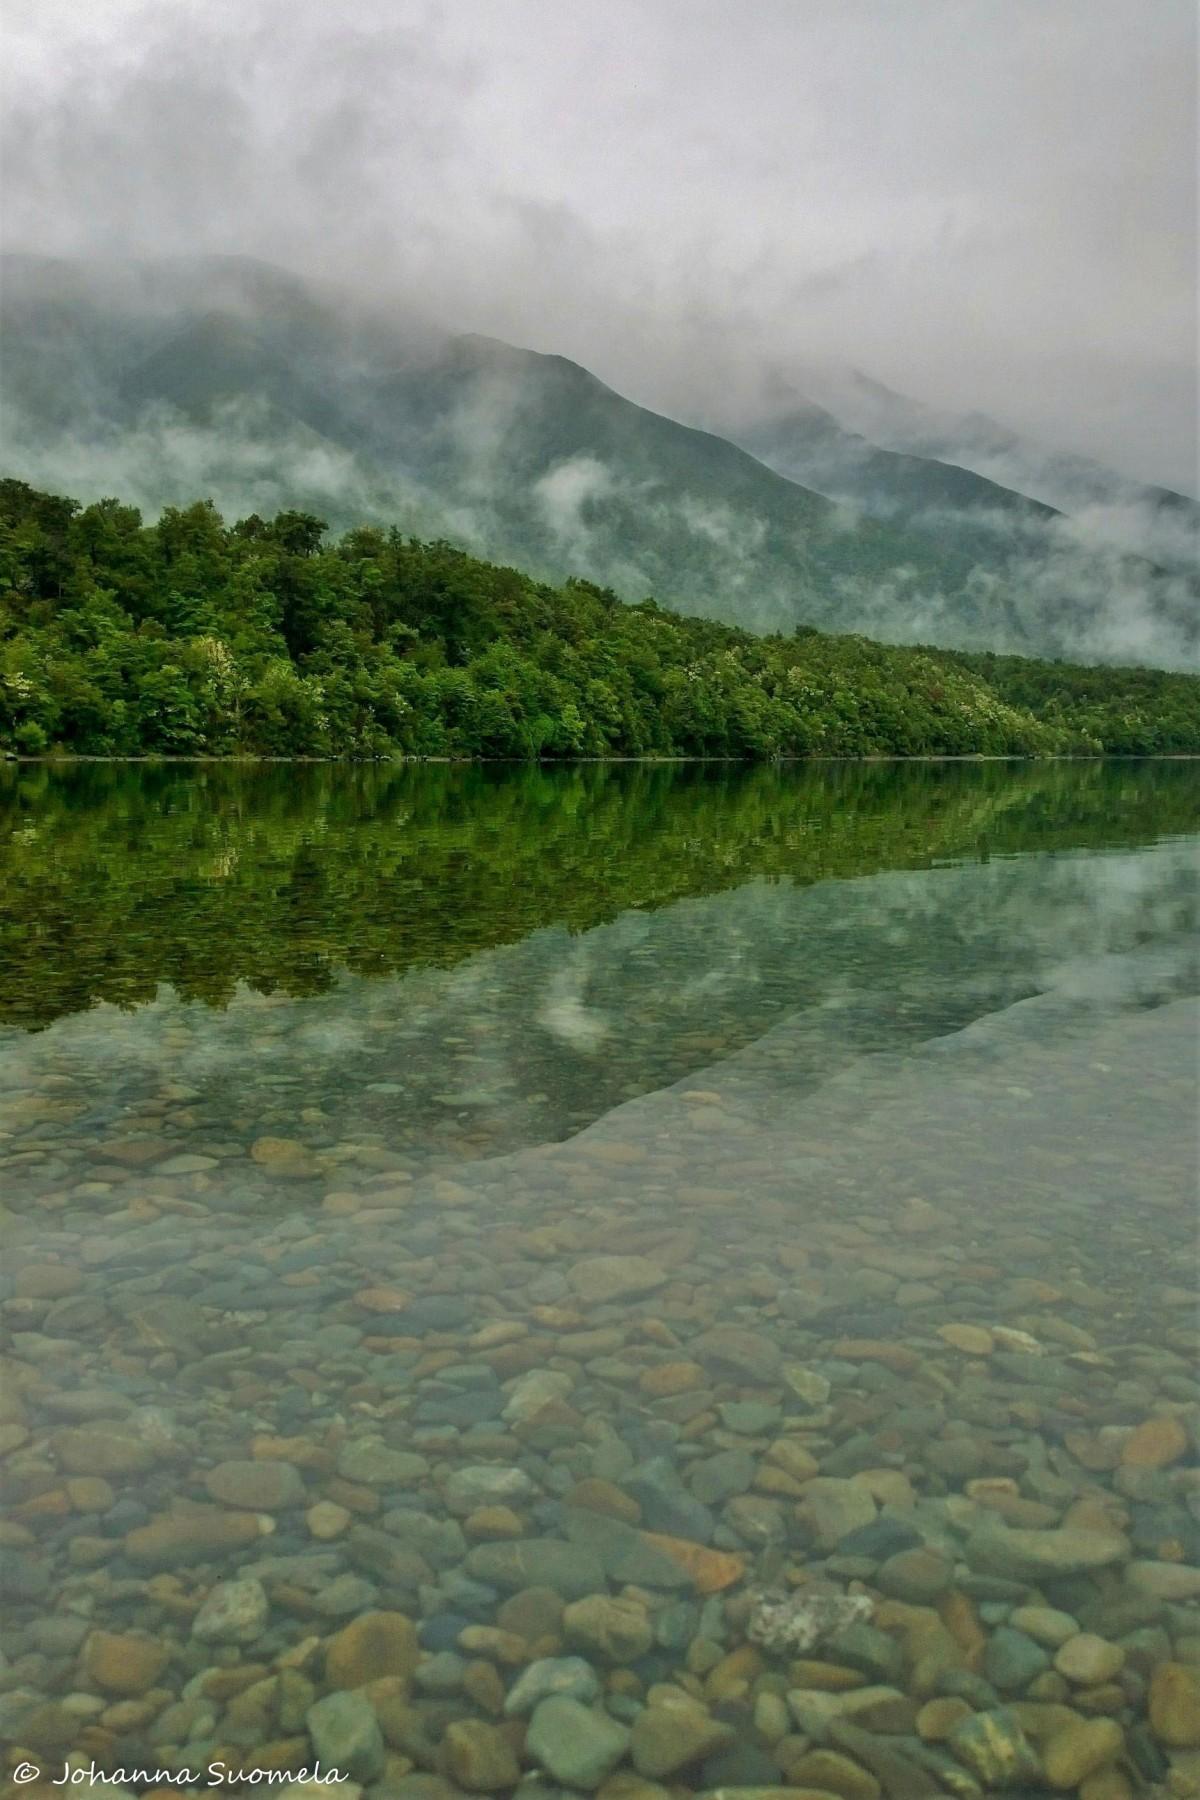 Uusi-Seelanti Nelson Lakes National Park